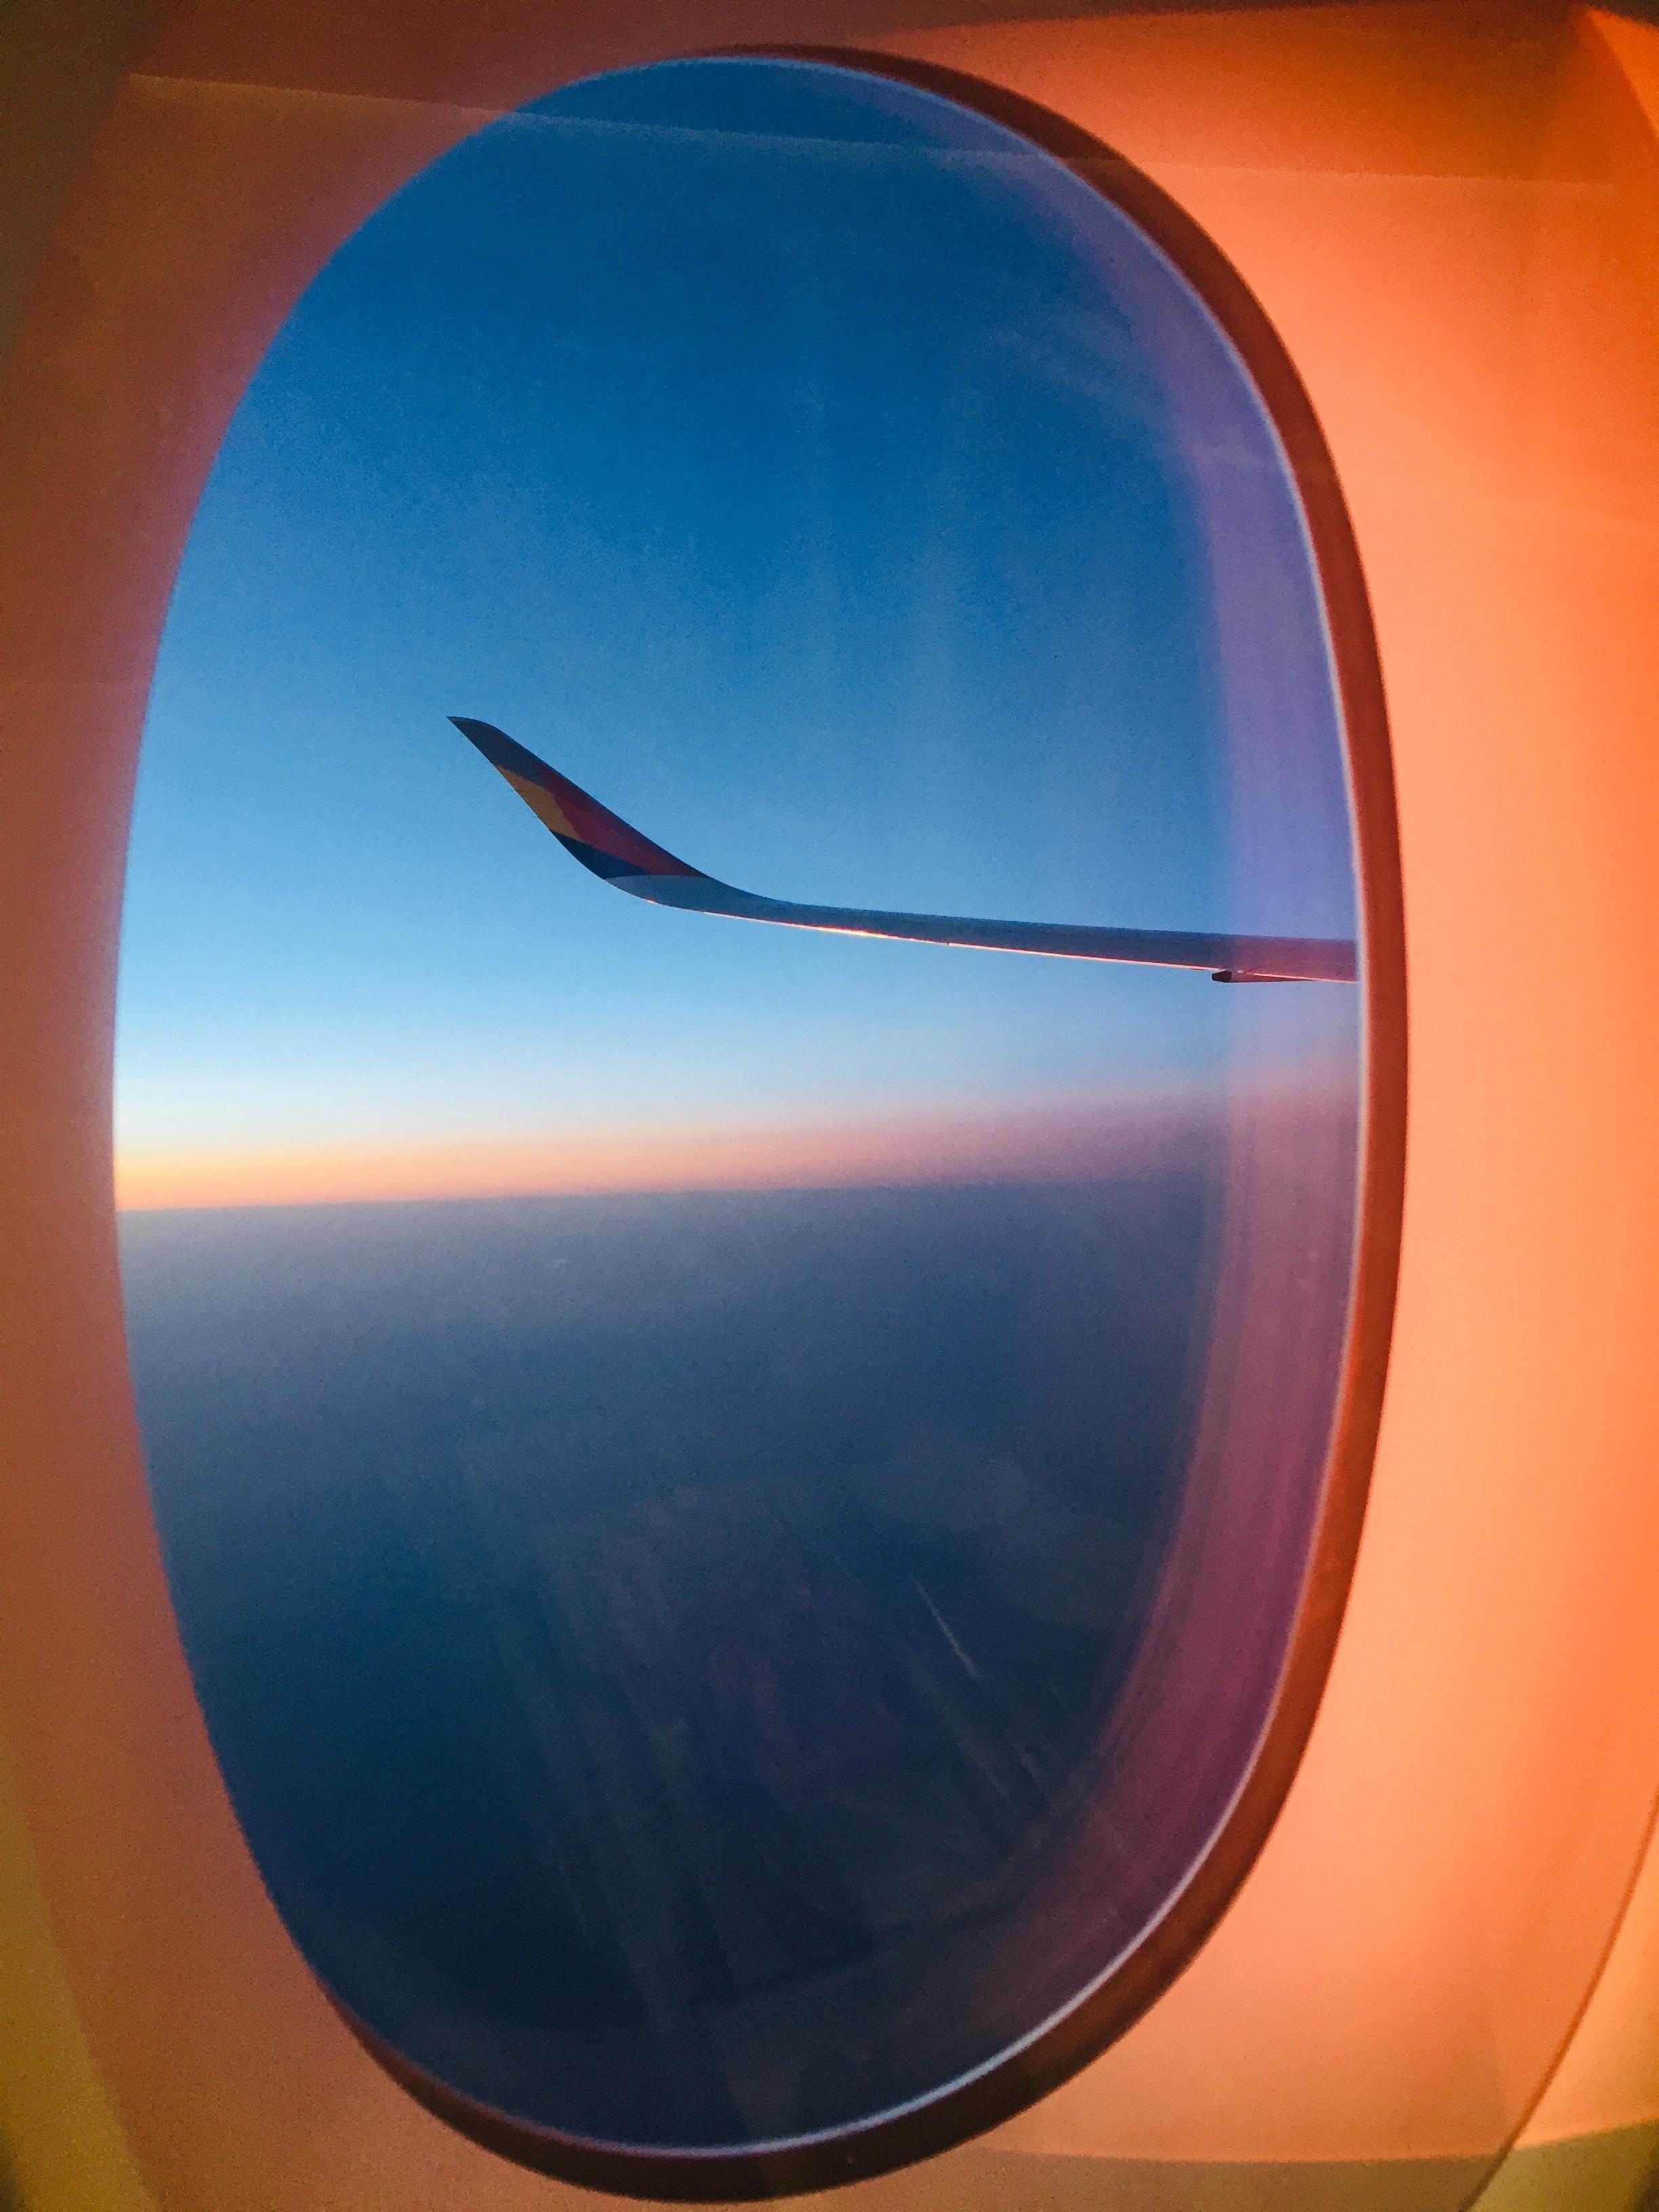 Airplane Window View Of Sky Free Stock Photo